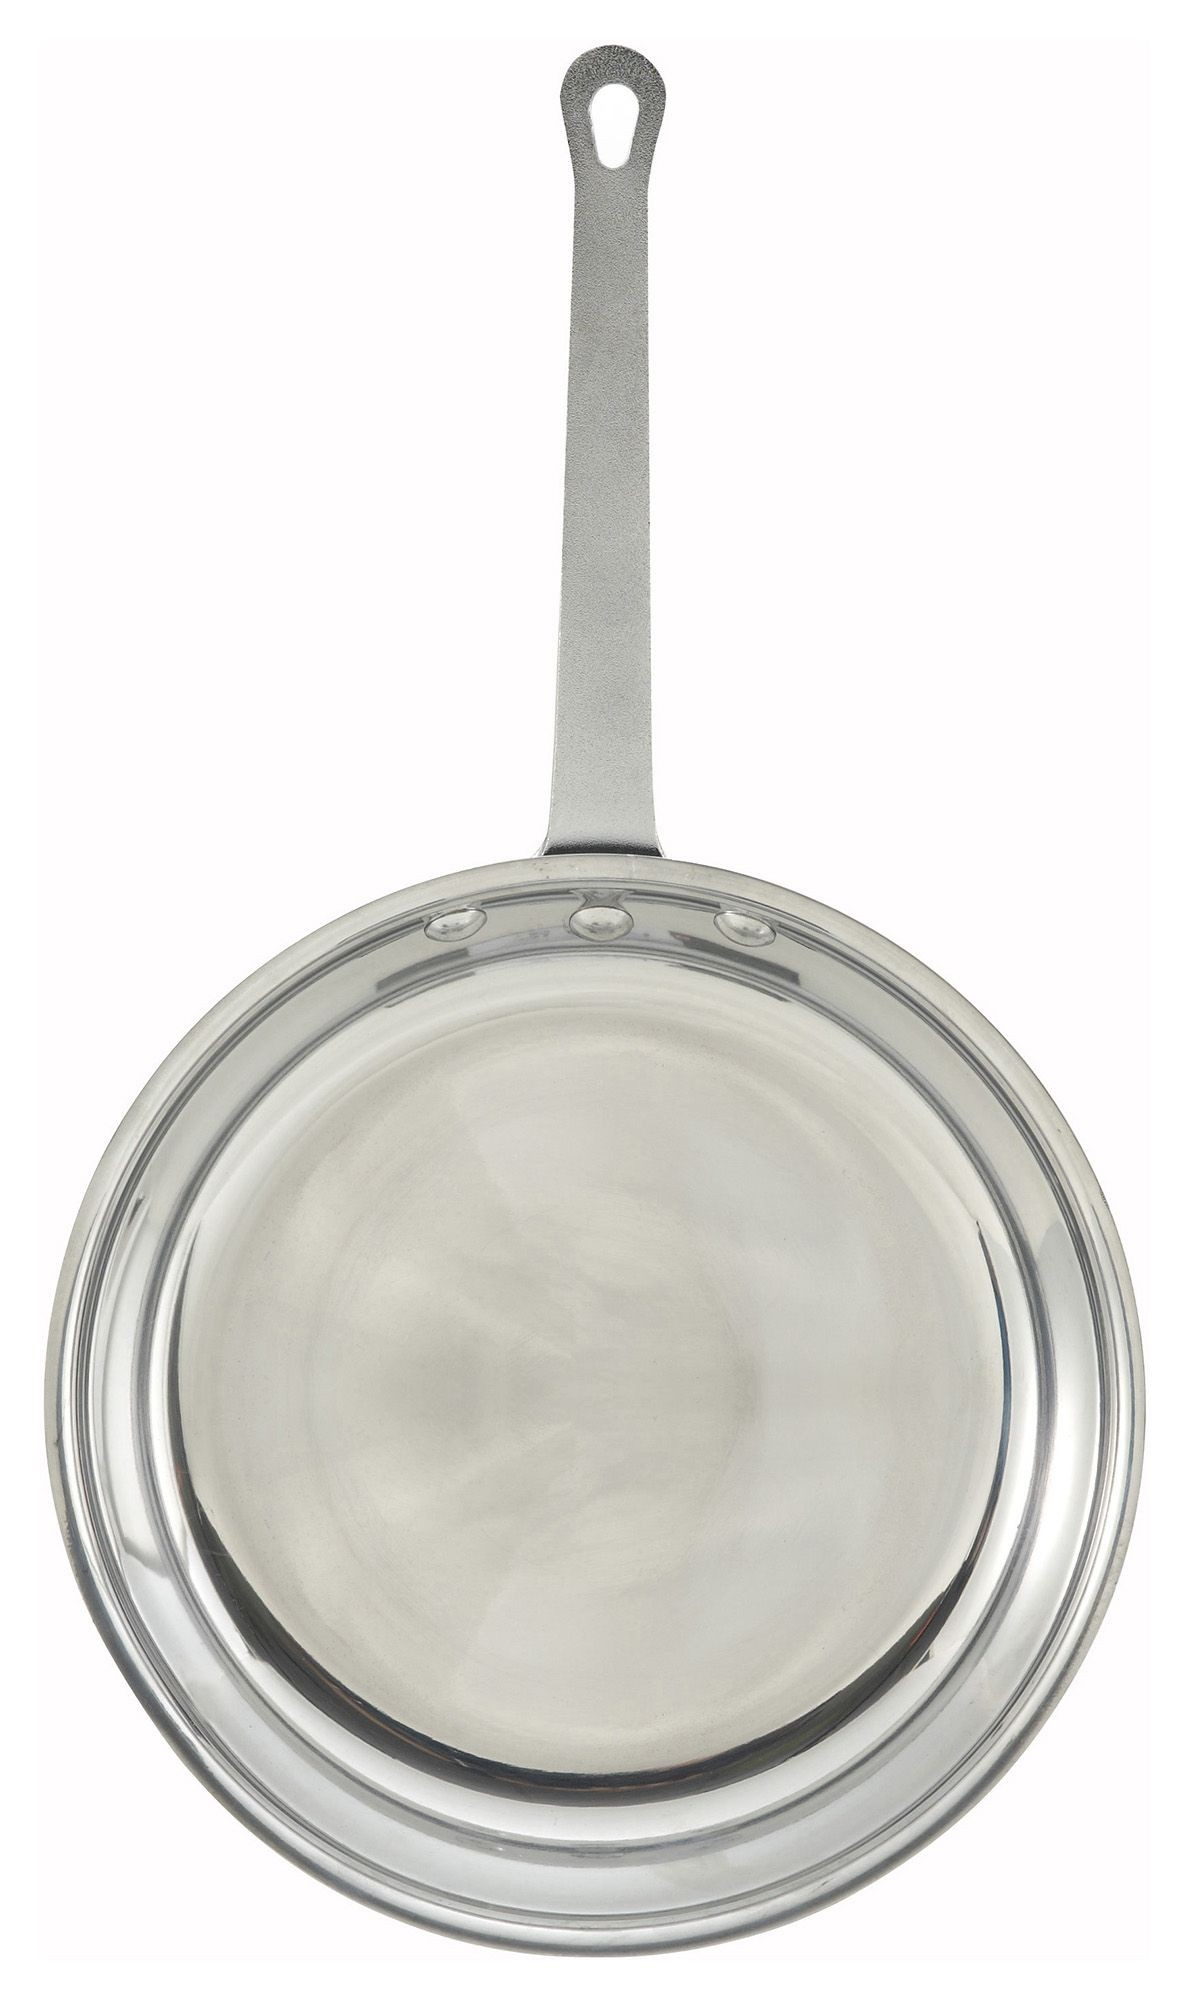 "Winco AFP-10 10"" Majestic Aluminum Fry Pan"